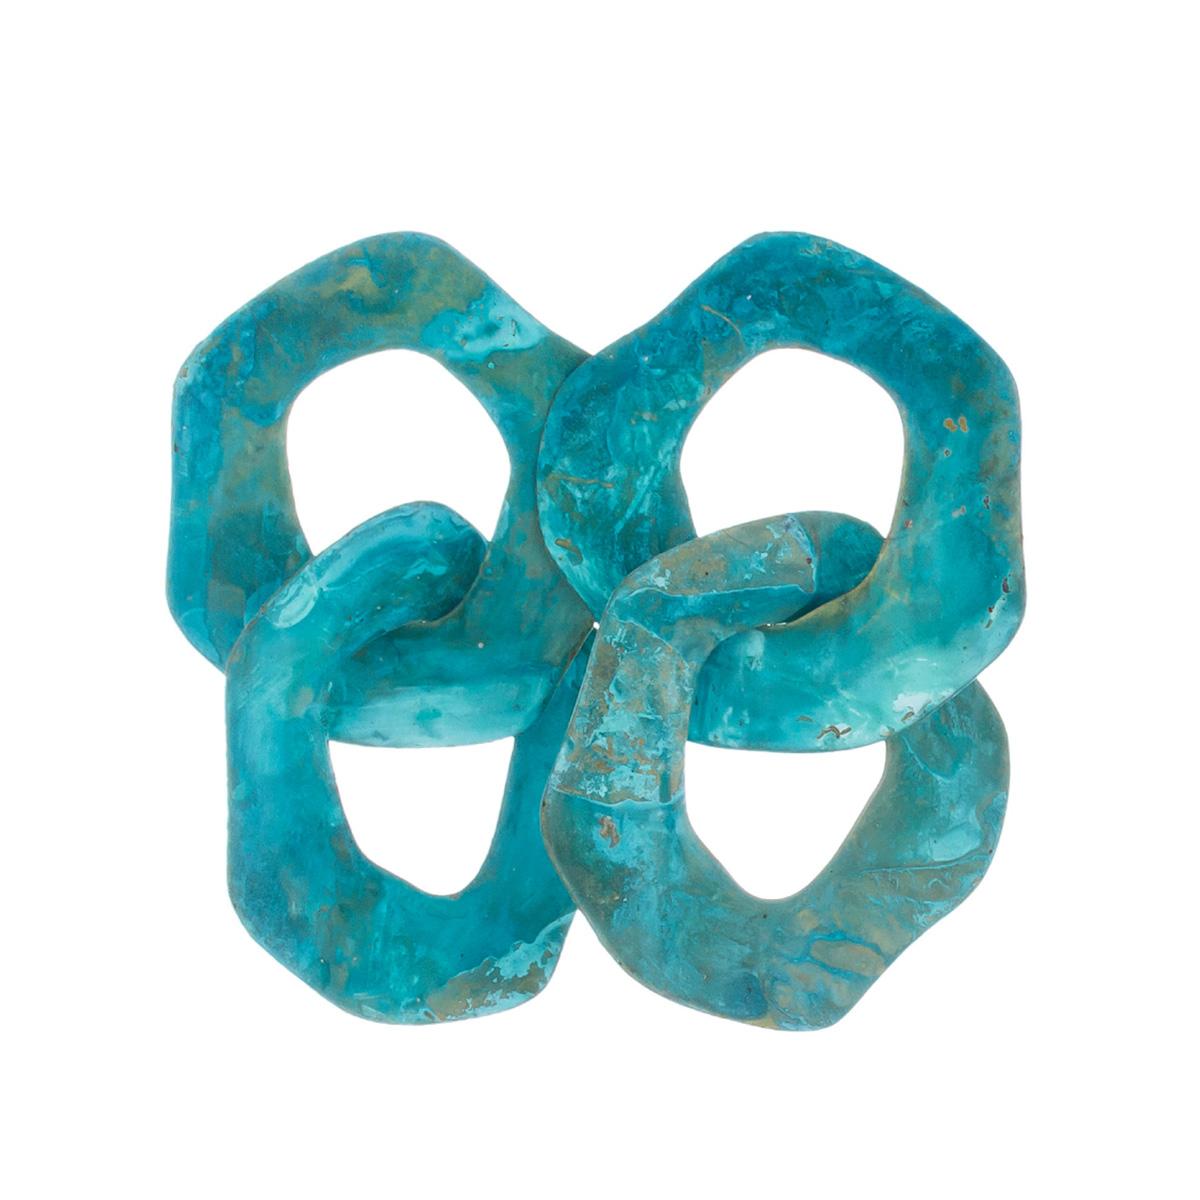 Interlock patina stud earrings by Sibilia